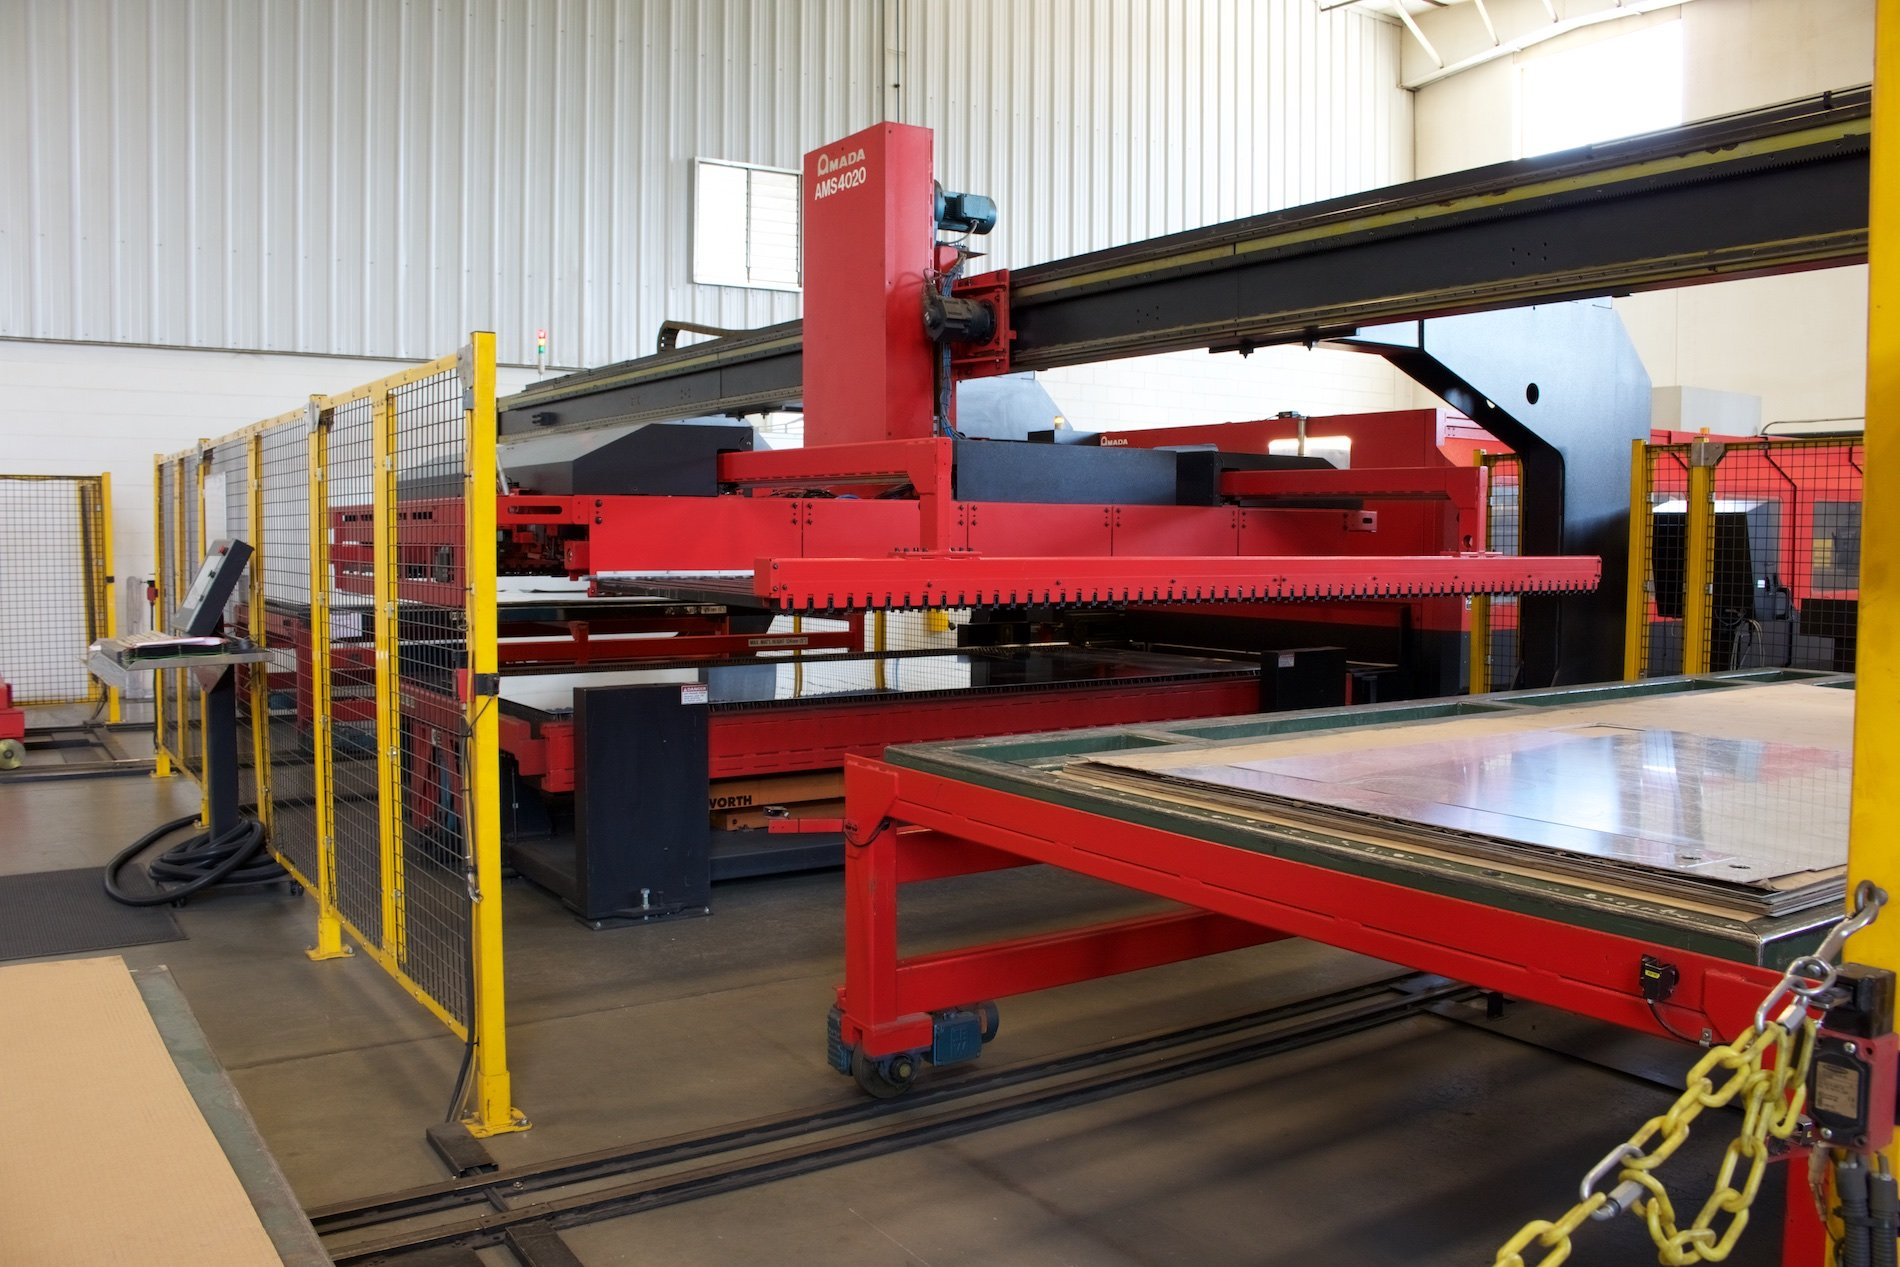 Badger Sheet Metal Works Specializes in Aluminum Sheet Metal Fabrication